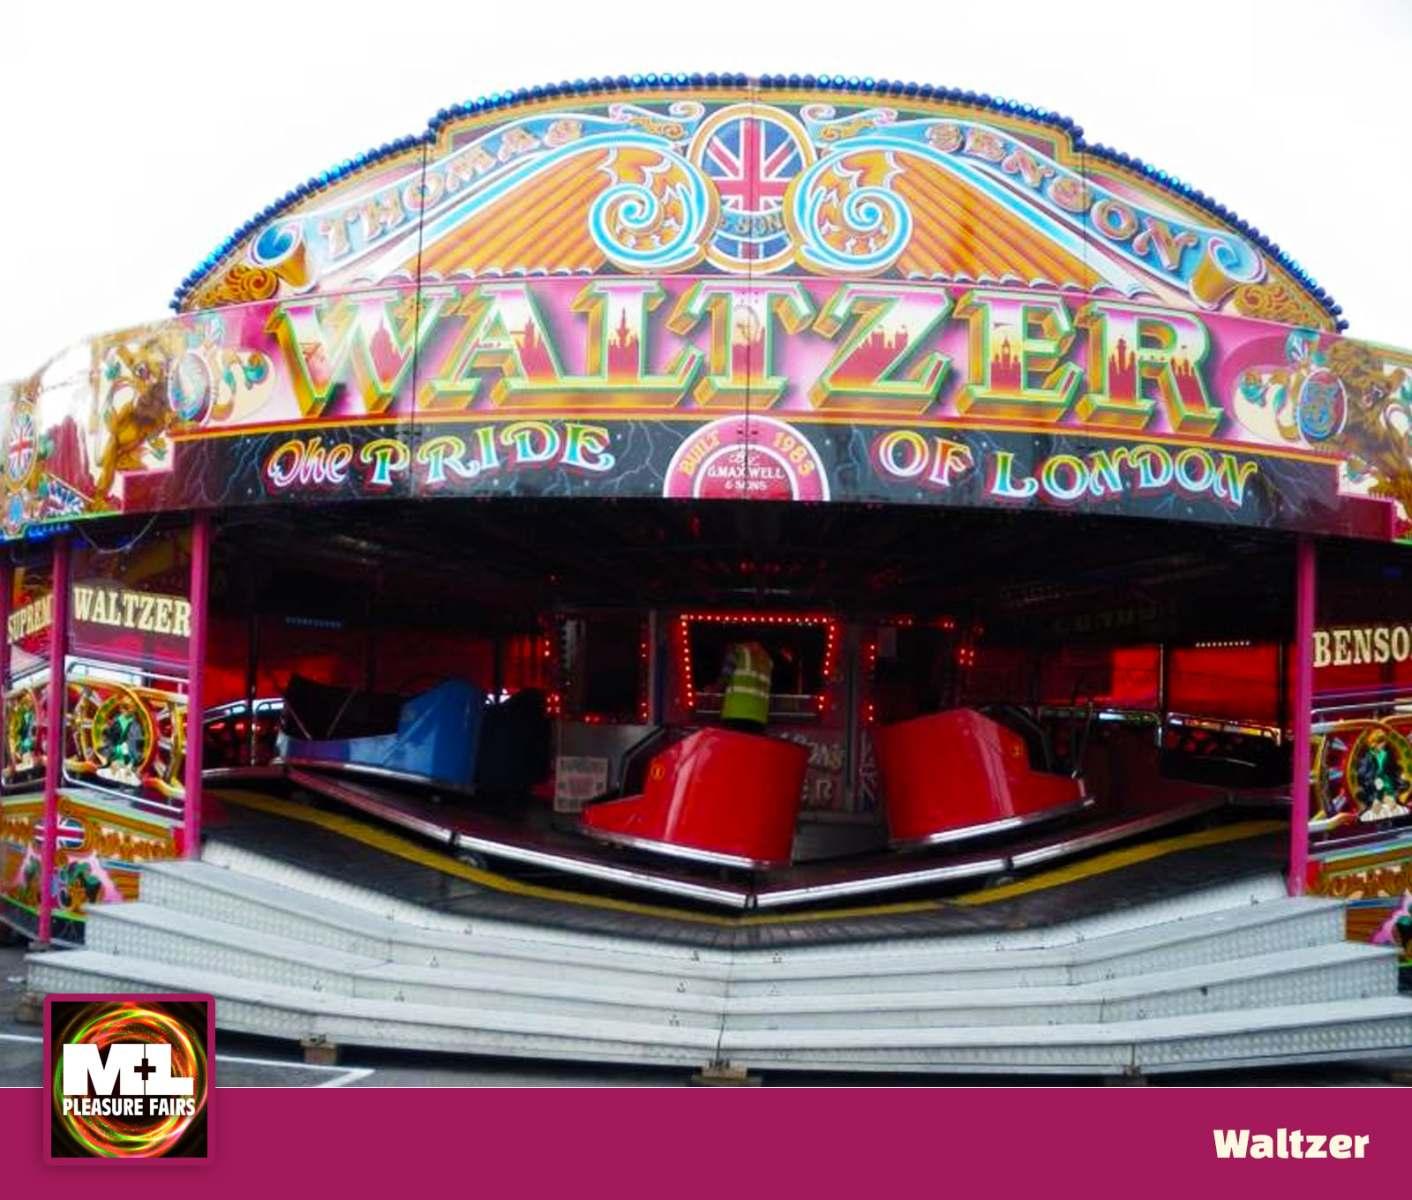 Waltzer Ride Image